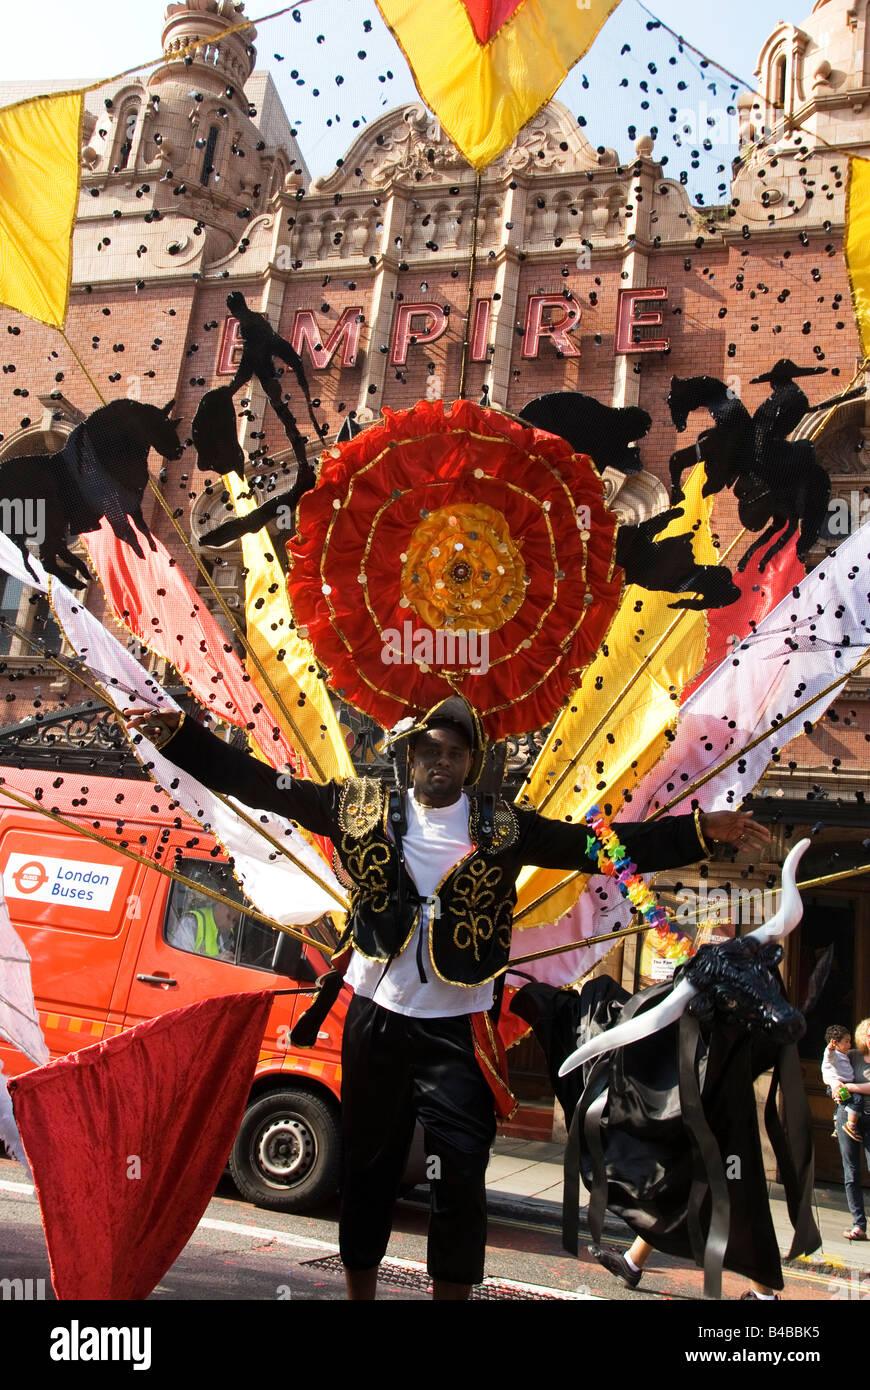 28 septembre 2008 Carnaval de Hackney Photo Stock